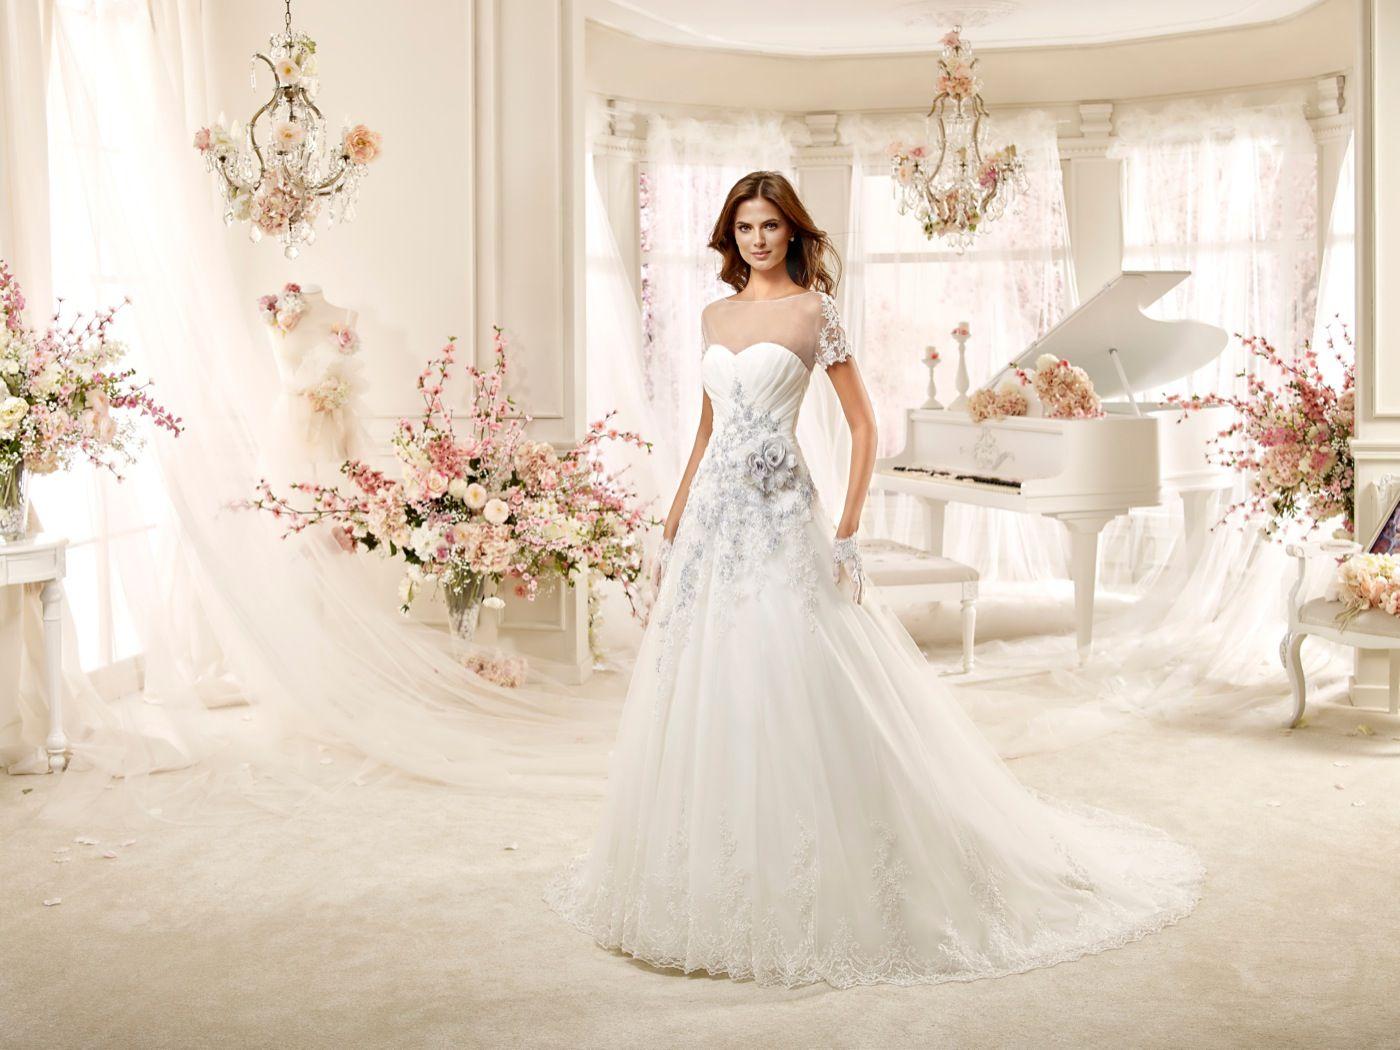 Shruthi In A Dreamy One Shoulder Pronovias Dress: #wedding #weddingdress #2016 #collection #bride #bridal